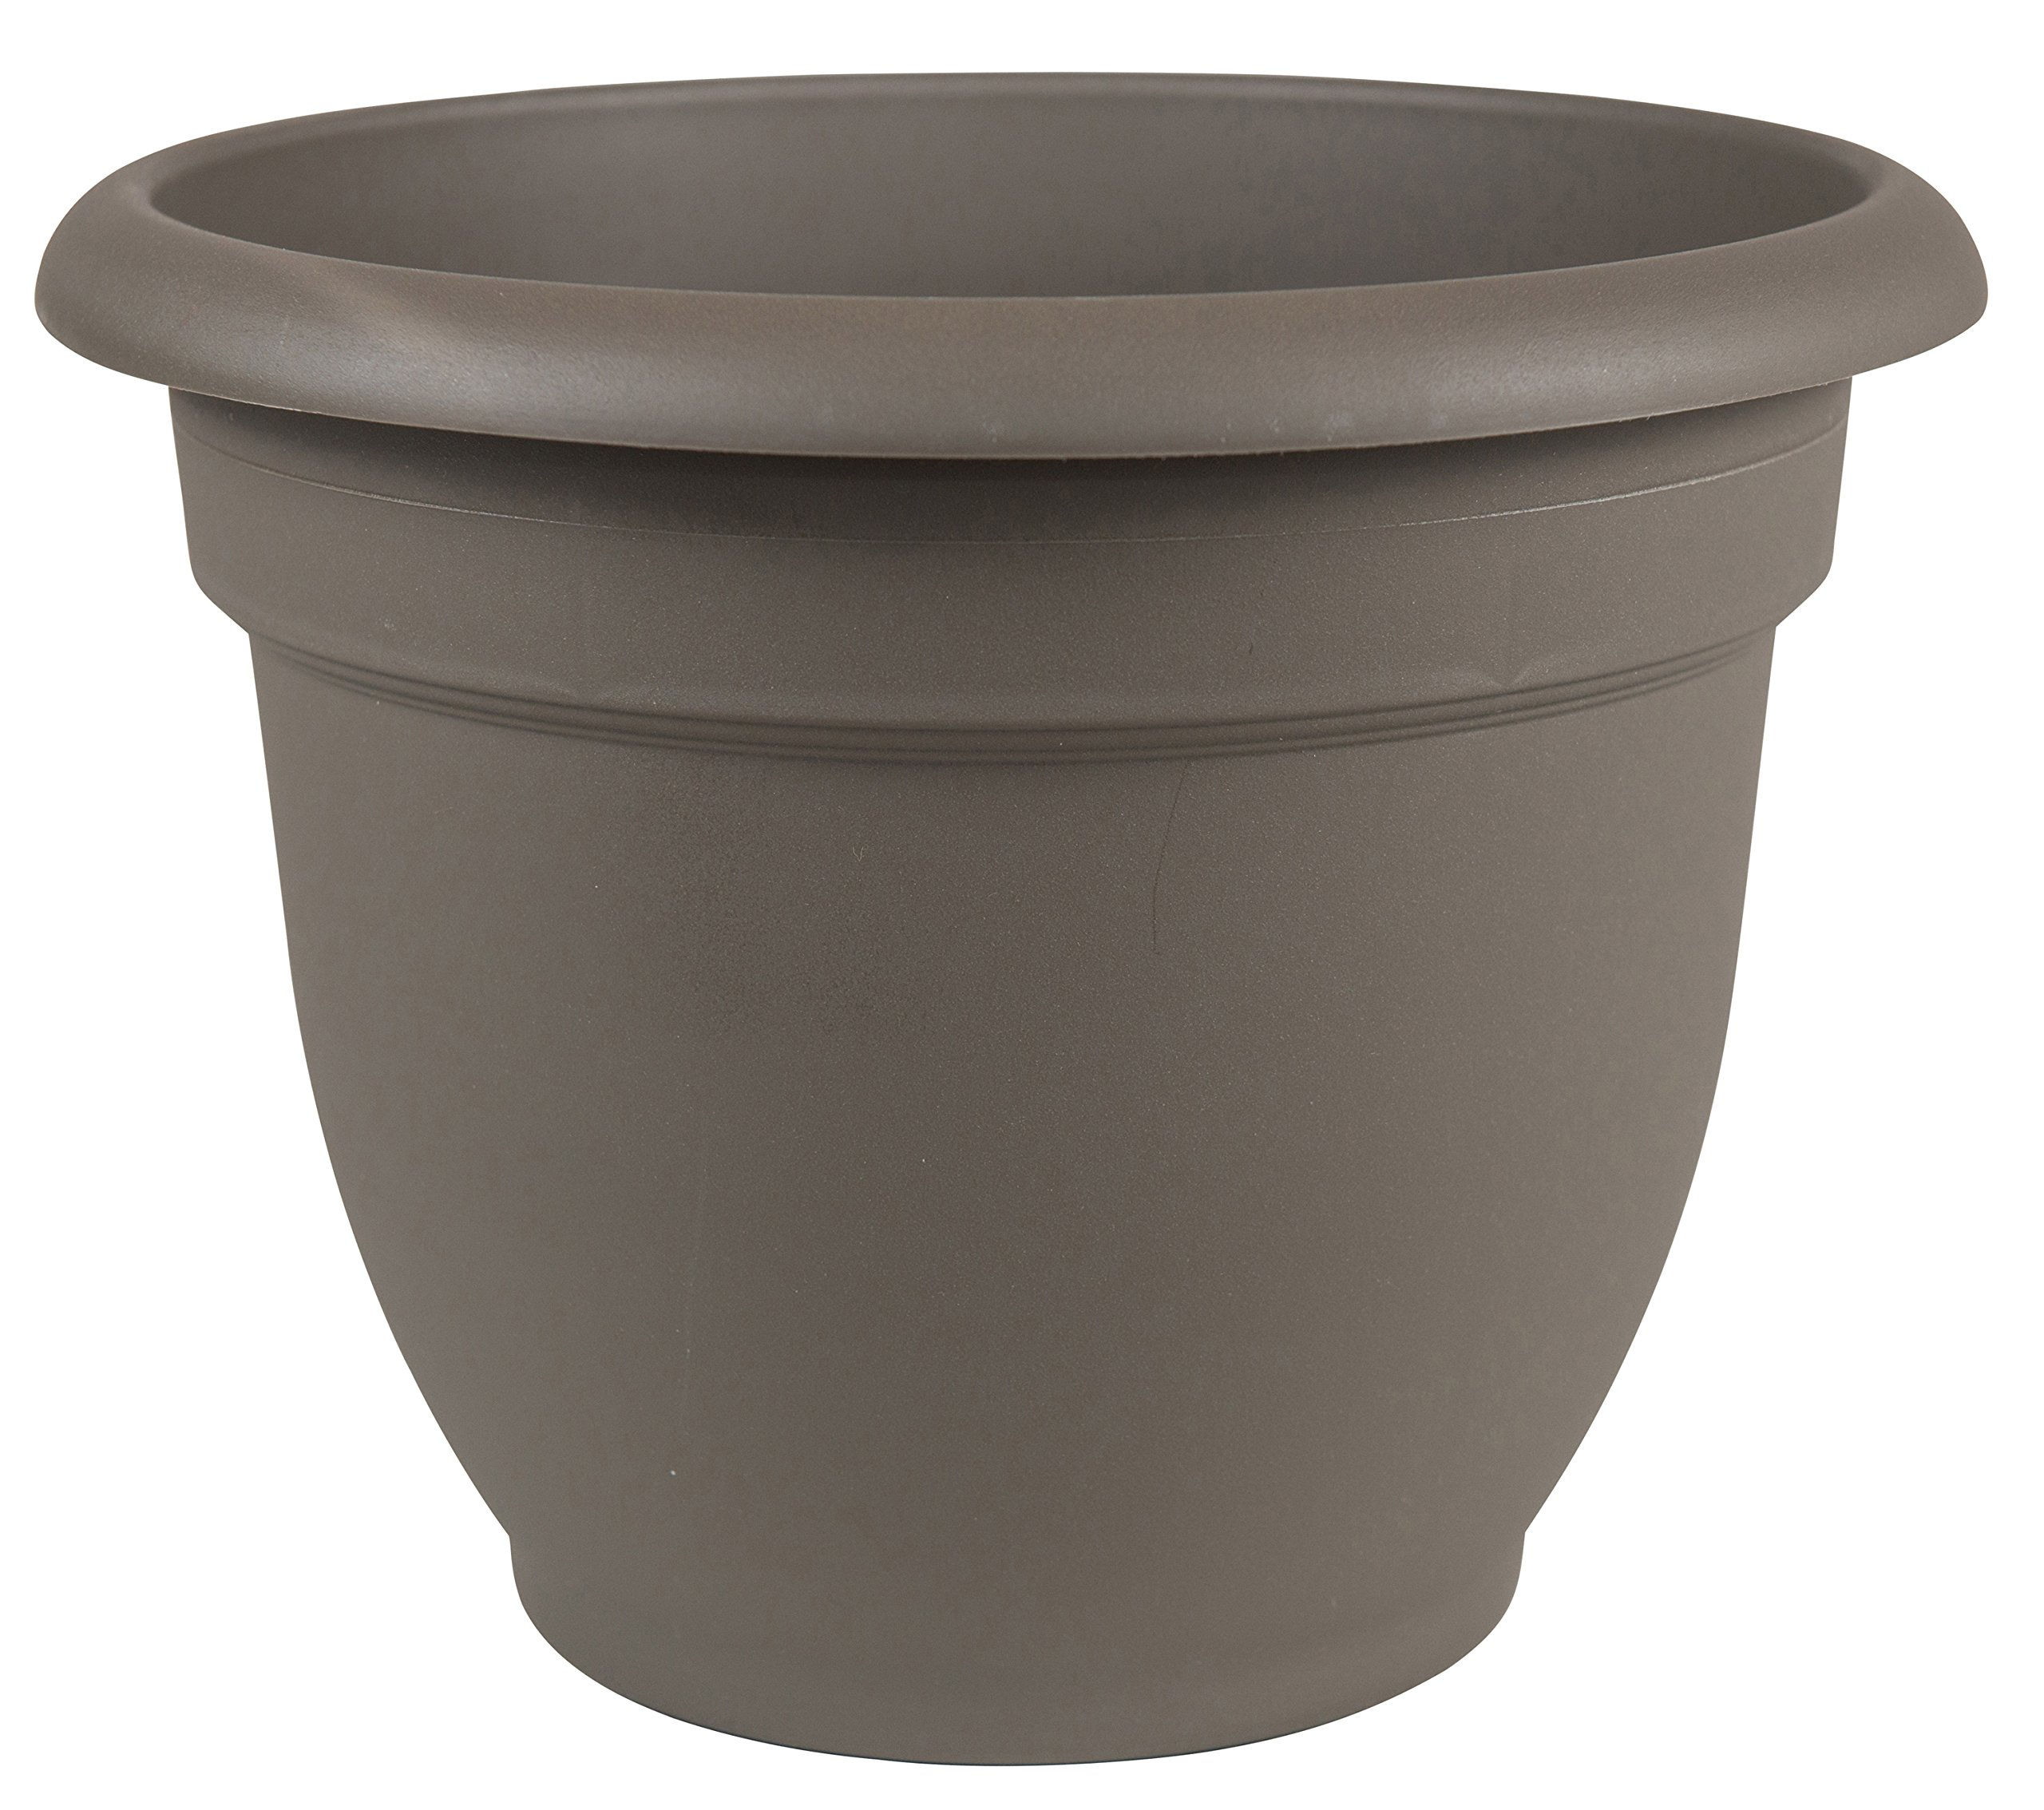 Bloem AP1260 Ariana Self Watering Planter, 12'', Peppercorn